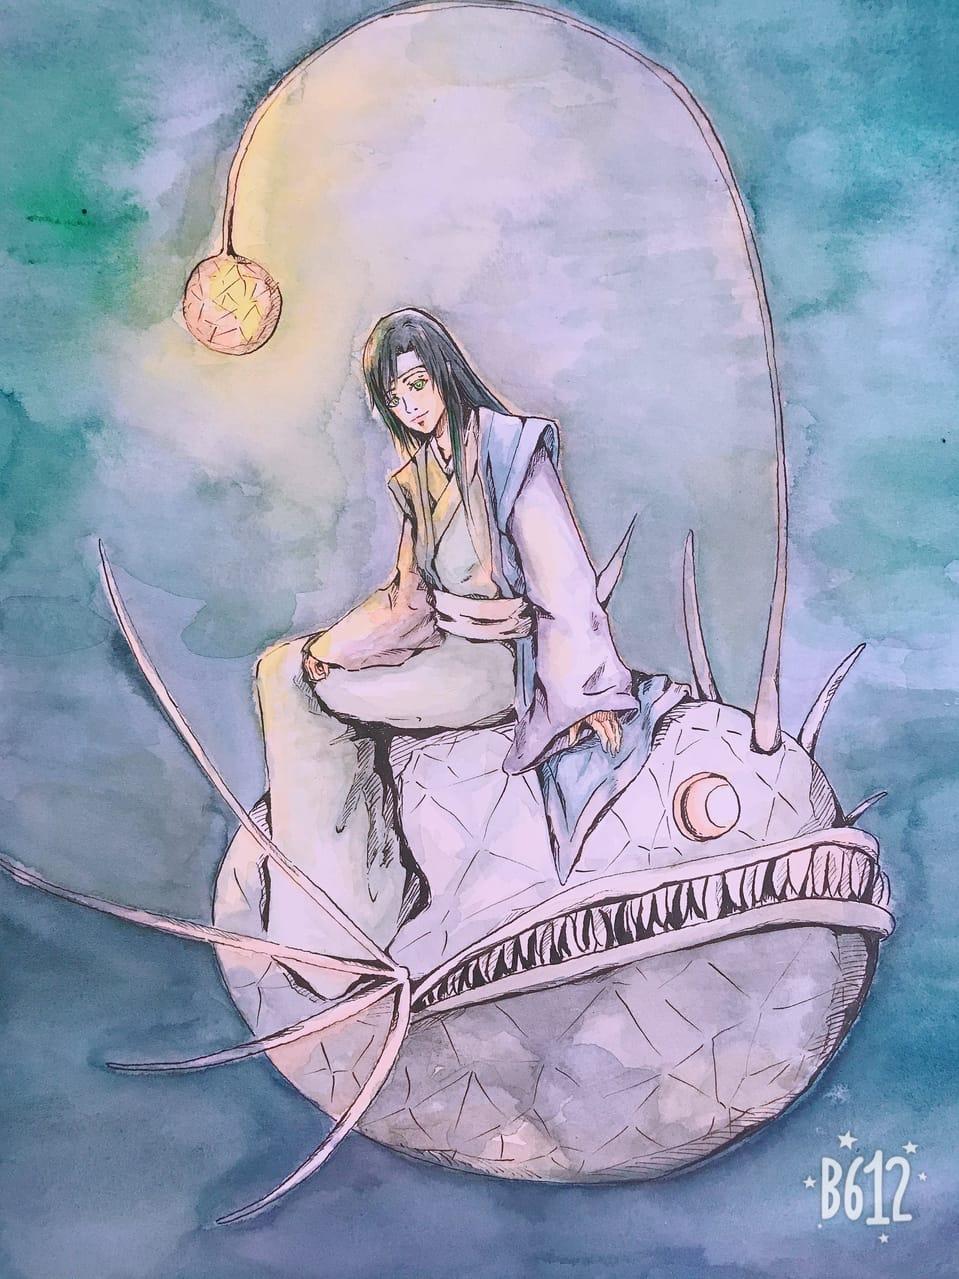 Lantern fish and boy Illust of Tea & T AnalogDrawing original watercolor illustration